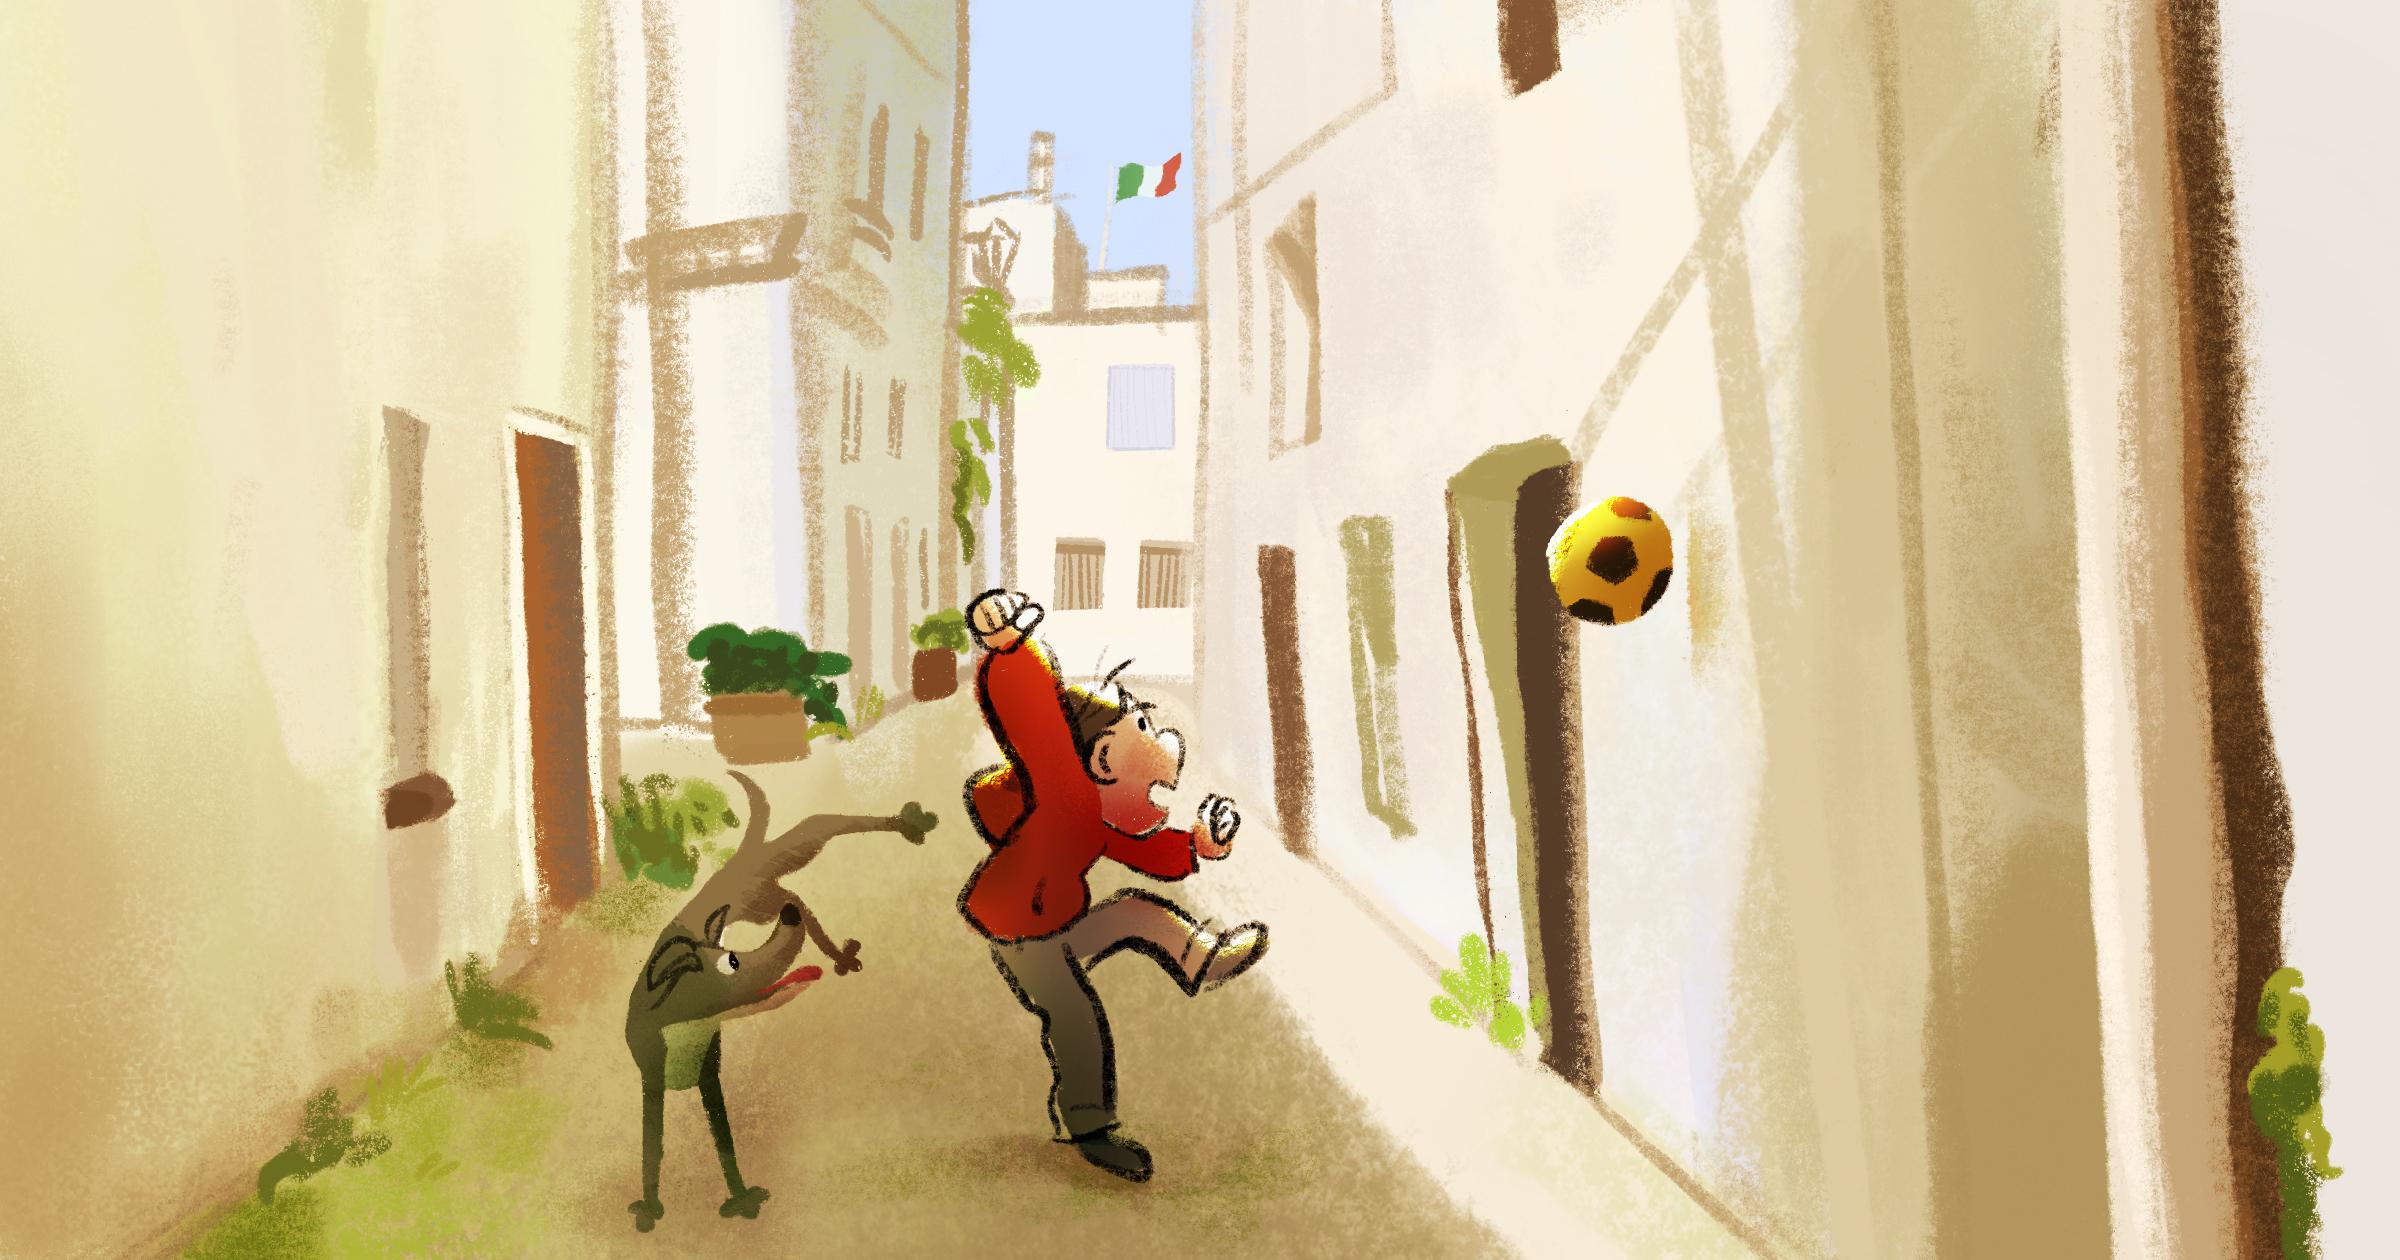 Italy by TA-DA! team artist Kelsey Suan